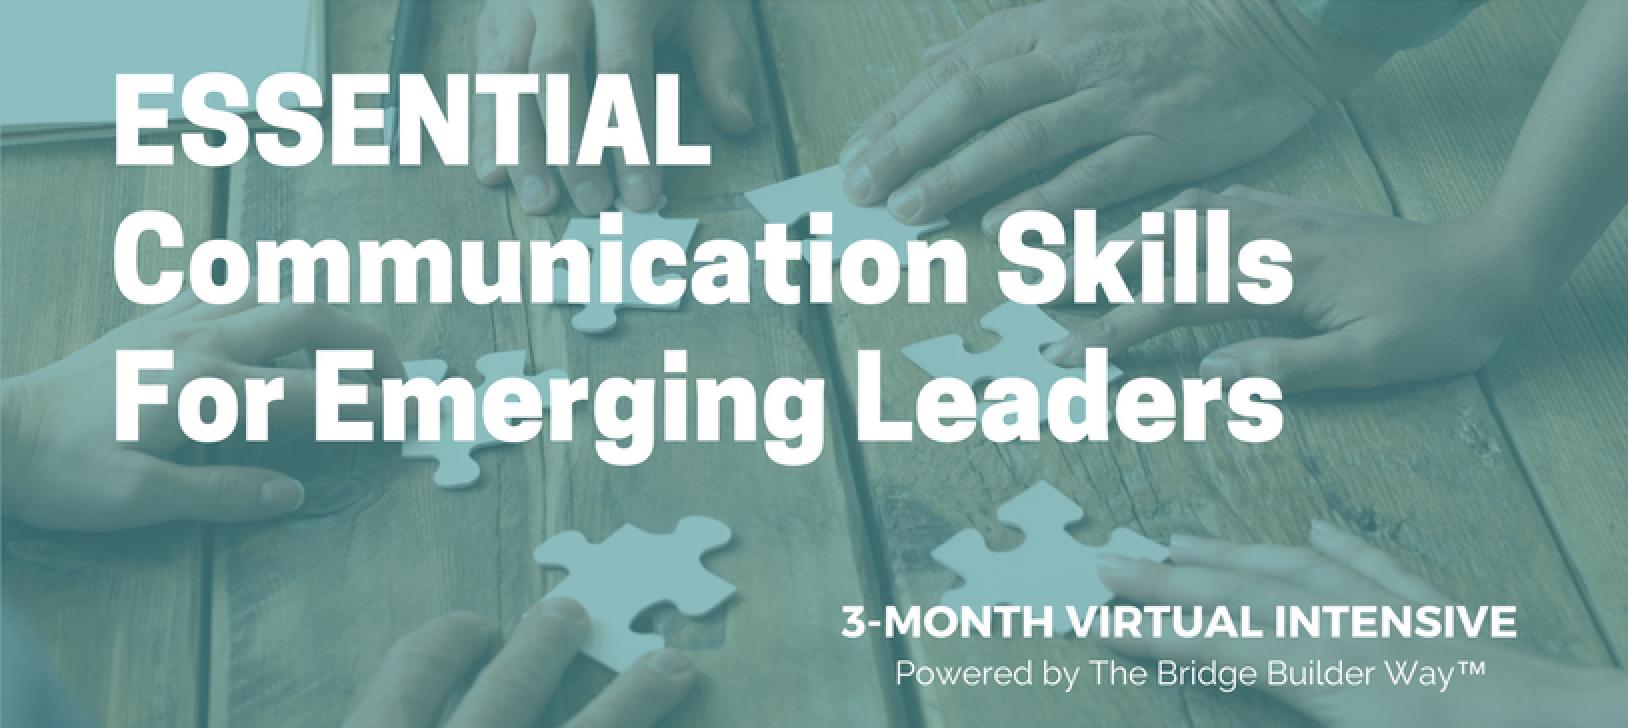 Essential Communication Skills for Emerging Leaders